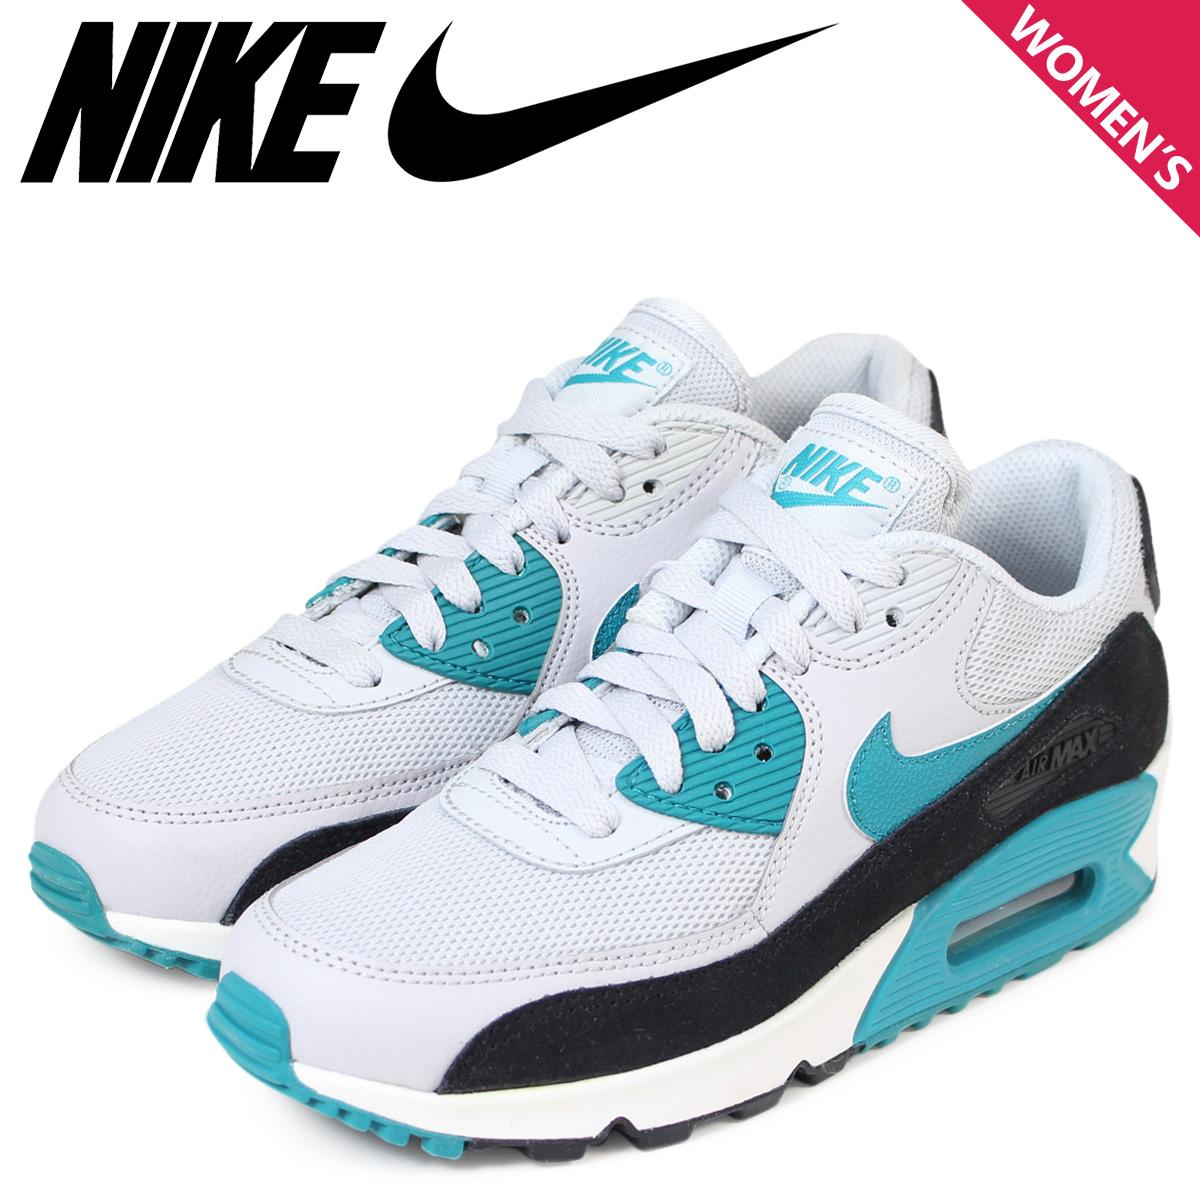 Nike NIKE Air Max 90 essential Lady's sneakers AIR MAX 90 WMNS ESSENTIAL 616,730 017 white